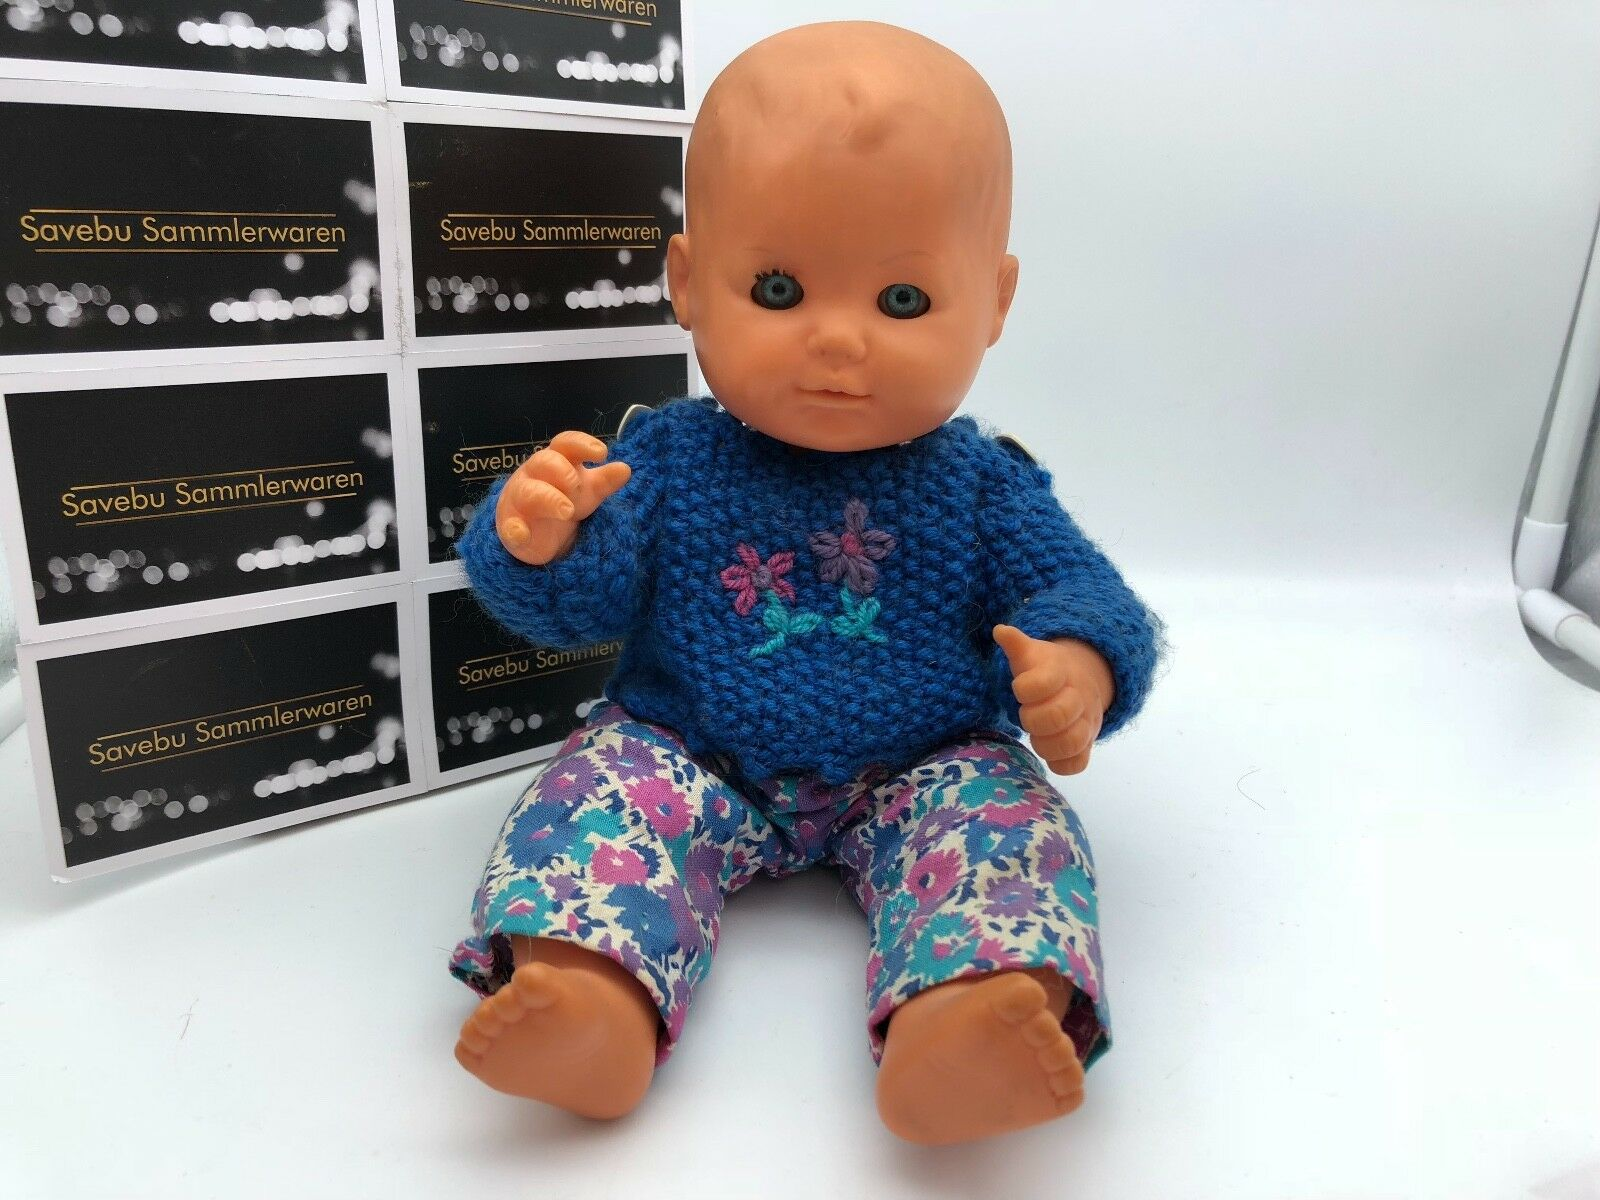 ZAPF artisti BAMBOLA vinile bambola 29 CM. OTTIMO stato stato stato 5ee04f